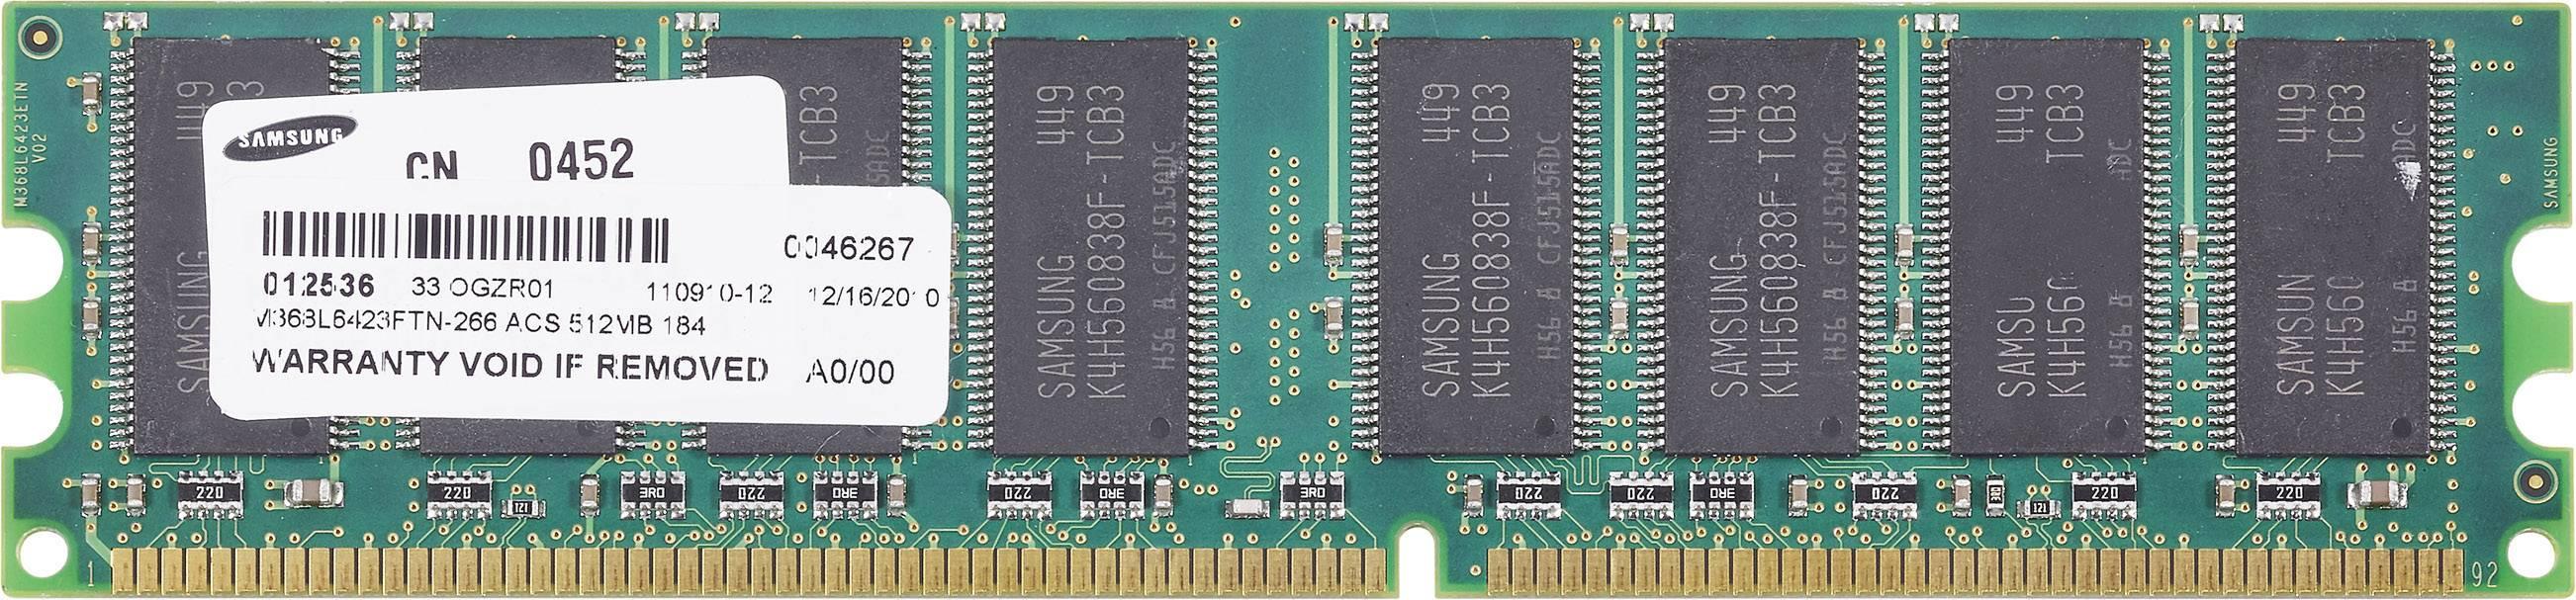 Pc Werkgeheugen Module Oem 512mb Ddr Ram 266mhz 512 Mb 1 X 266 Mhz